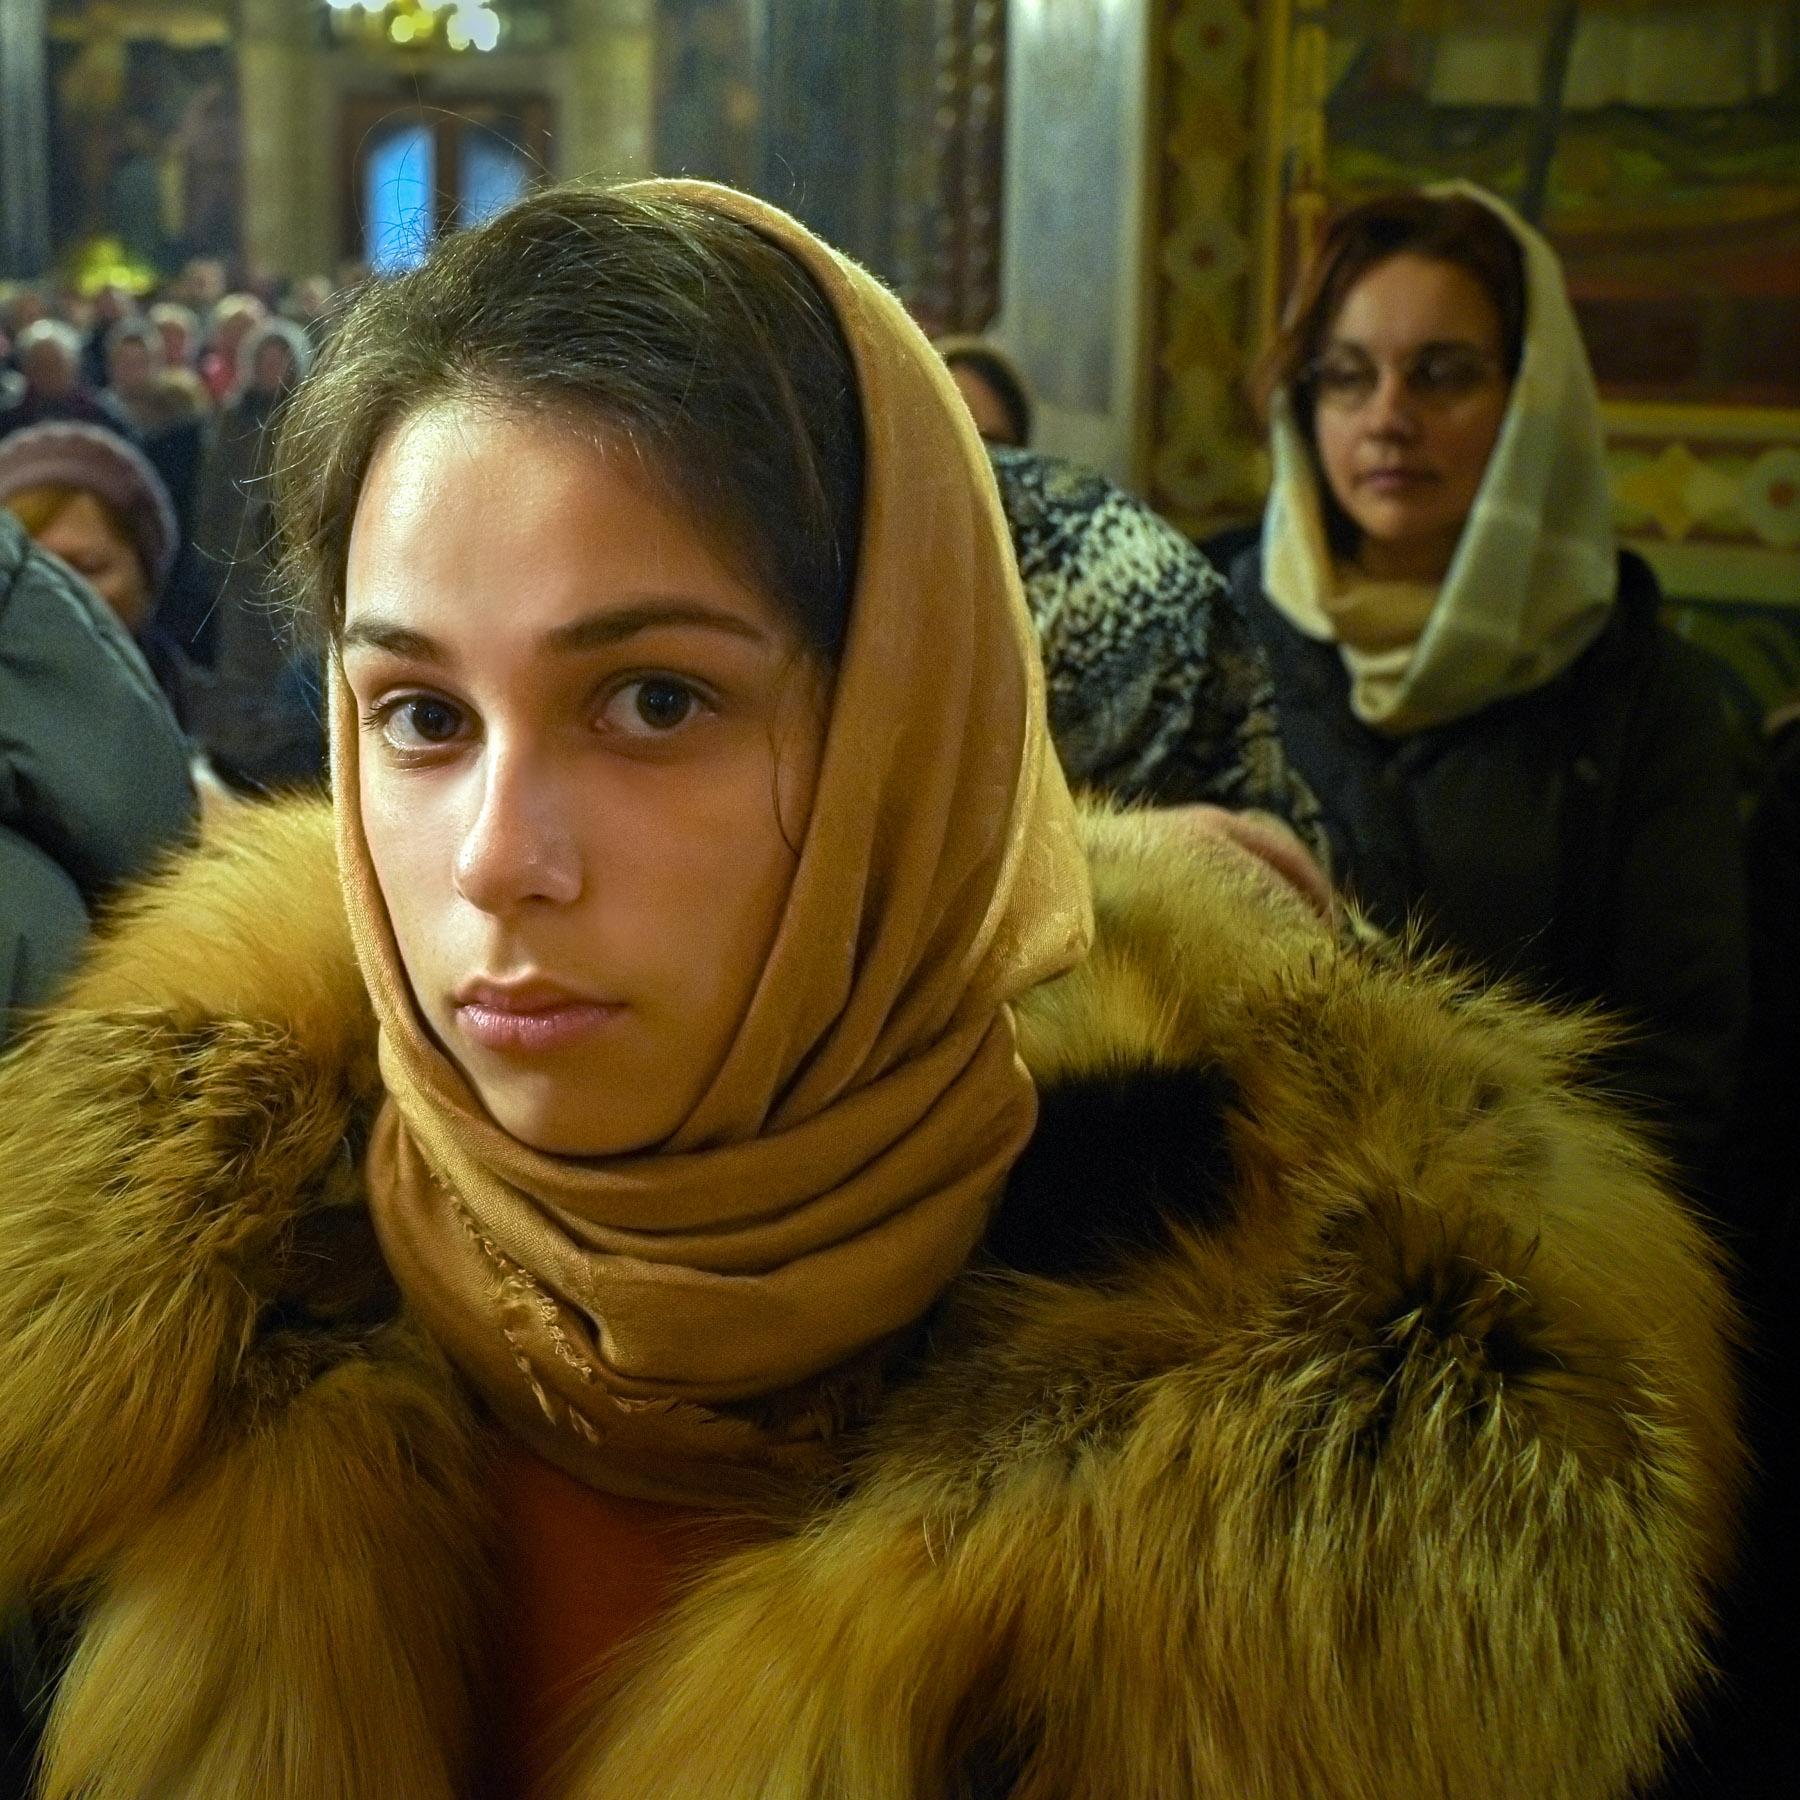 photos of orthodox christmas 0138 2